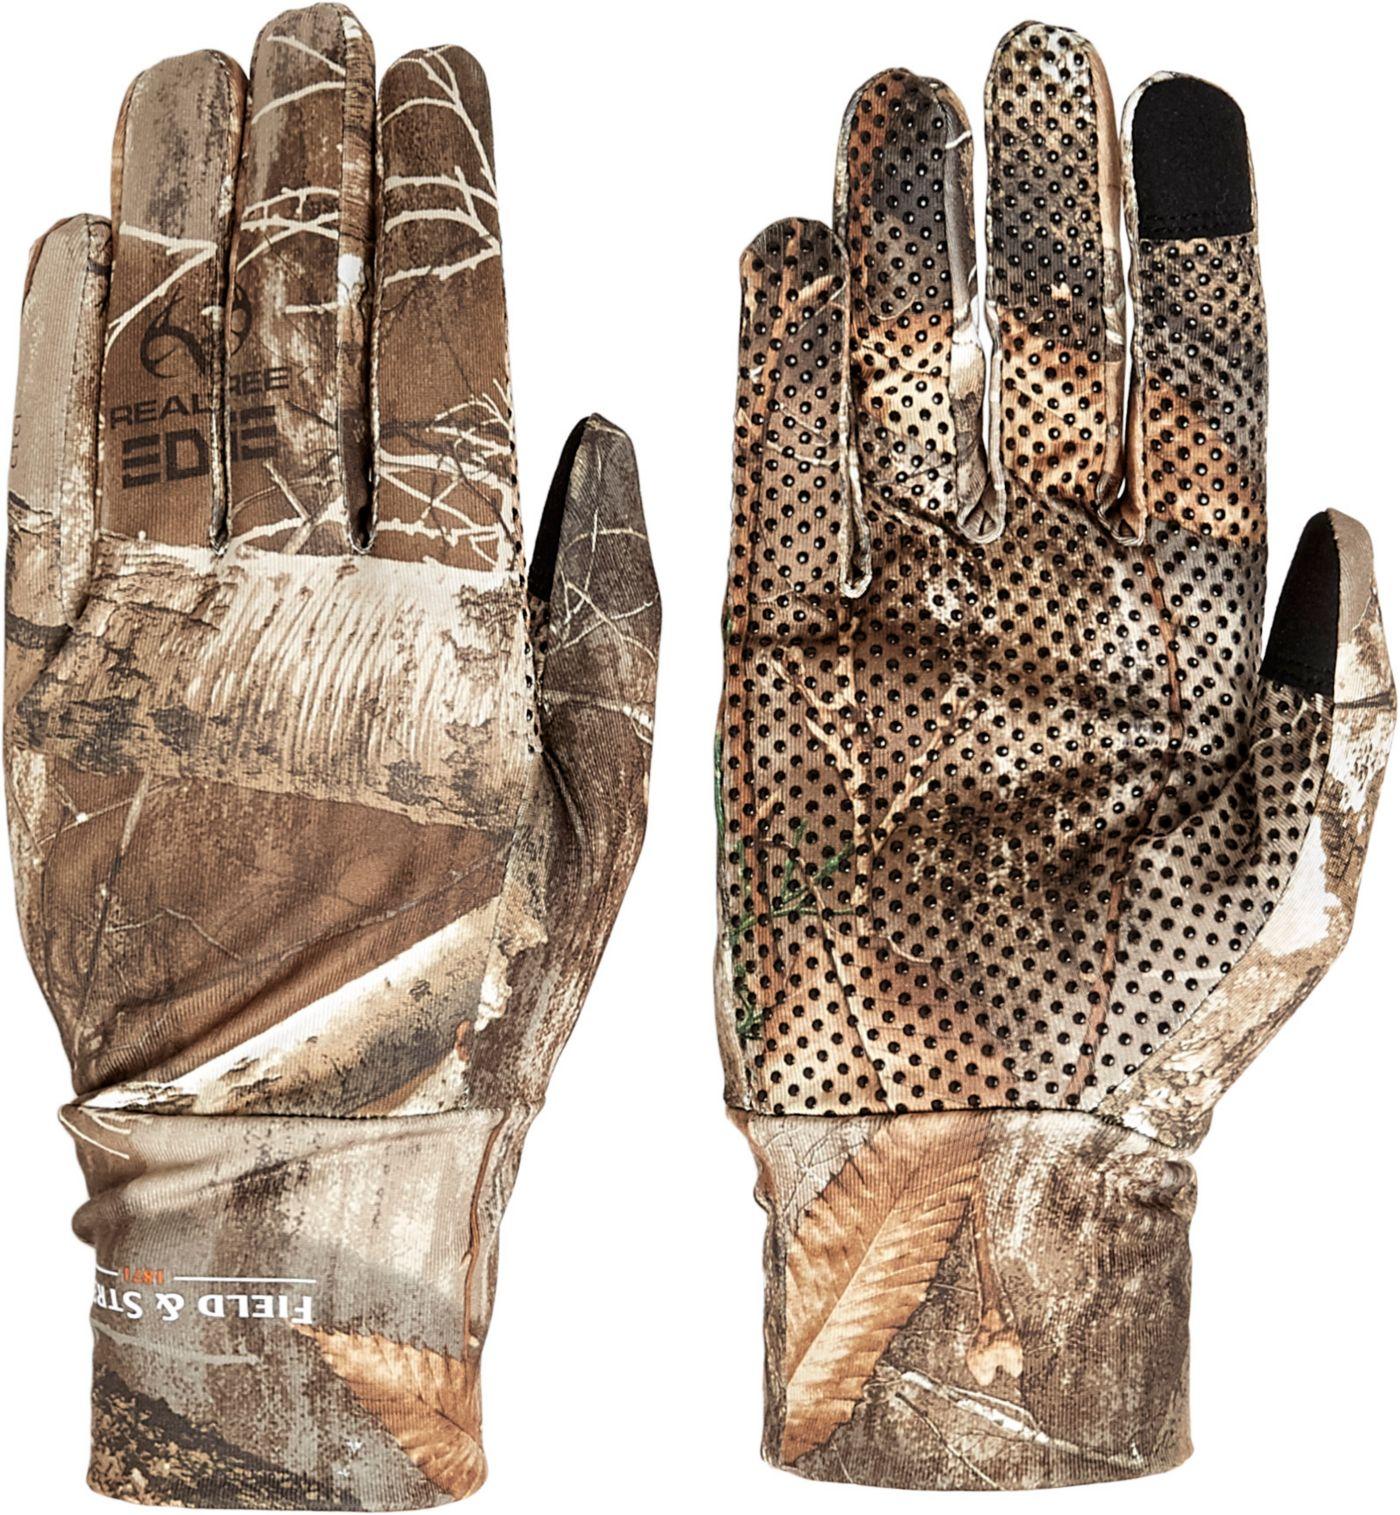 Field & Stream Men's Lightweight Core Hunting Gloves